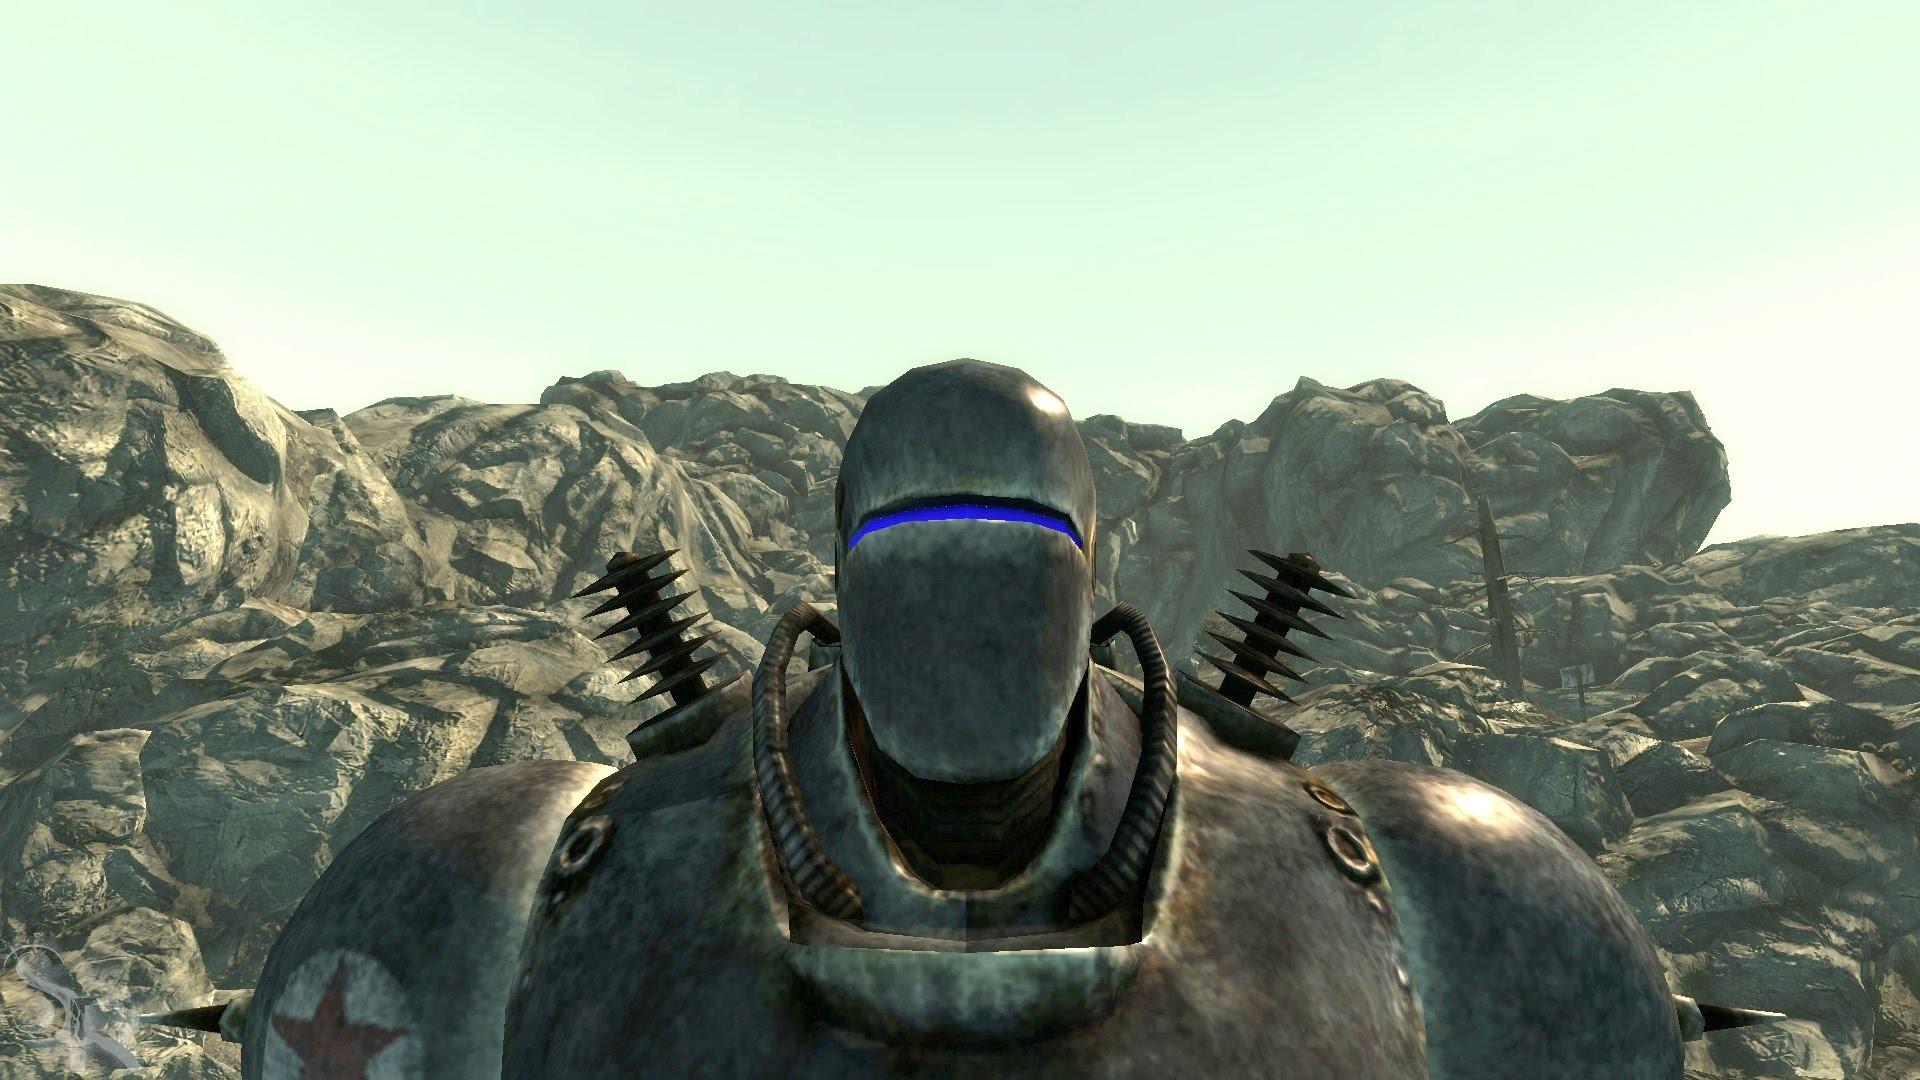 Res: 1920x1080, Liberty Prime destroys SM Behemoths, CR Sergeants, and the Enclave - YouTube